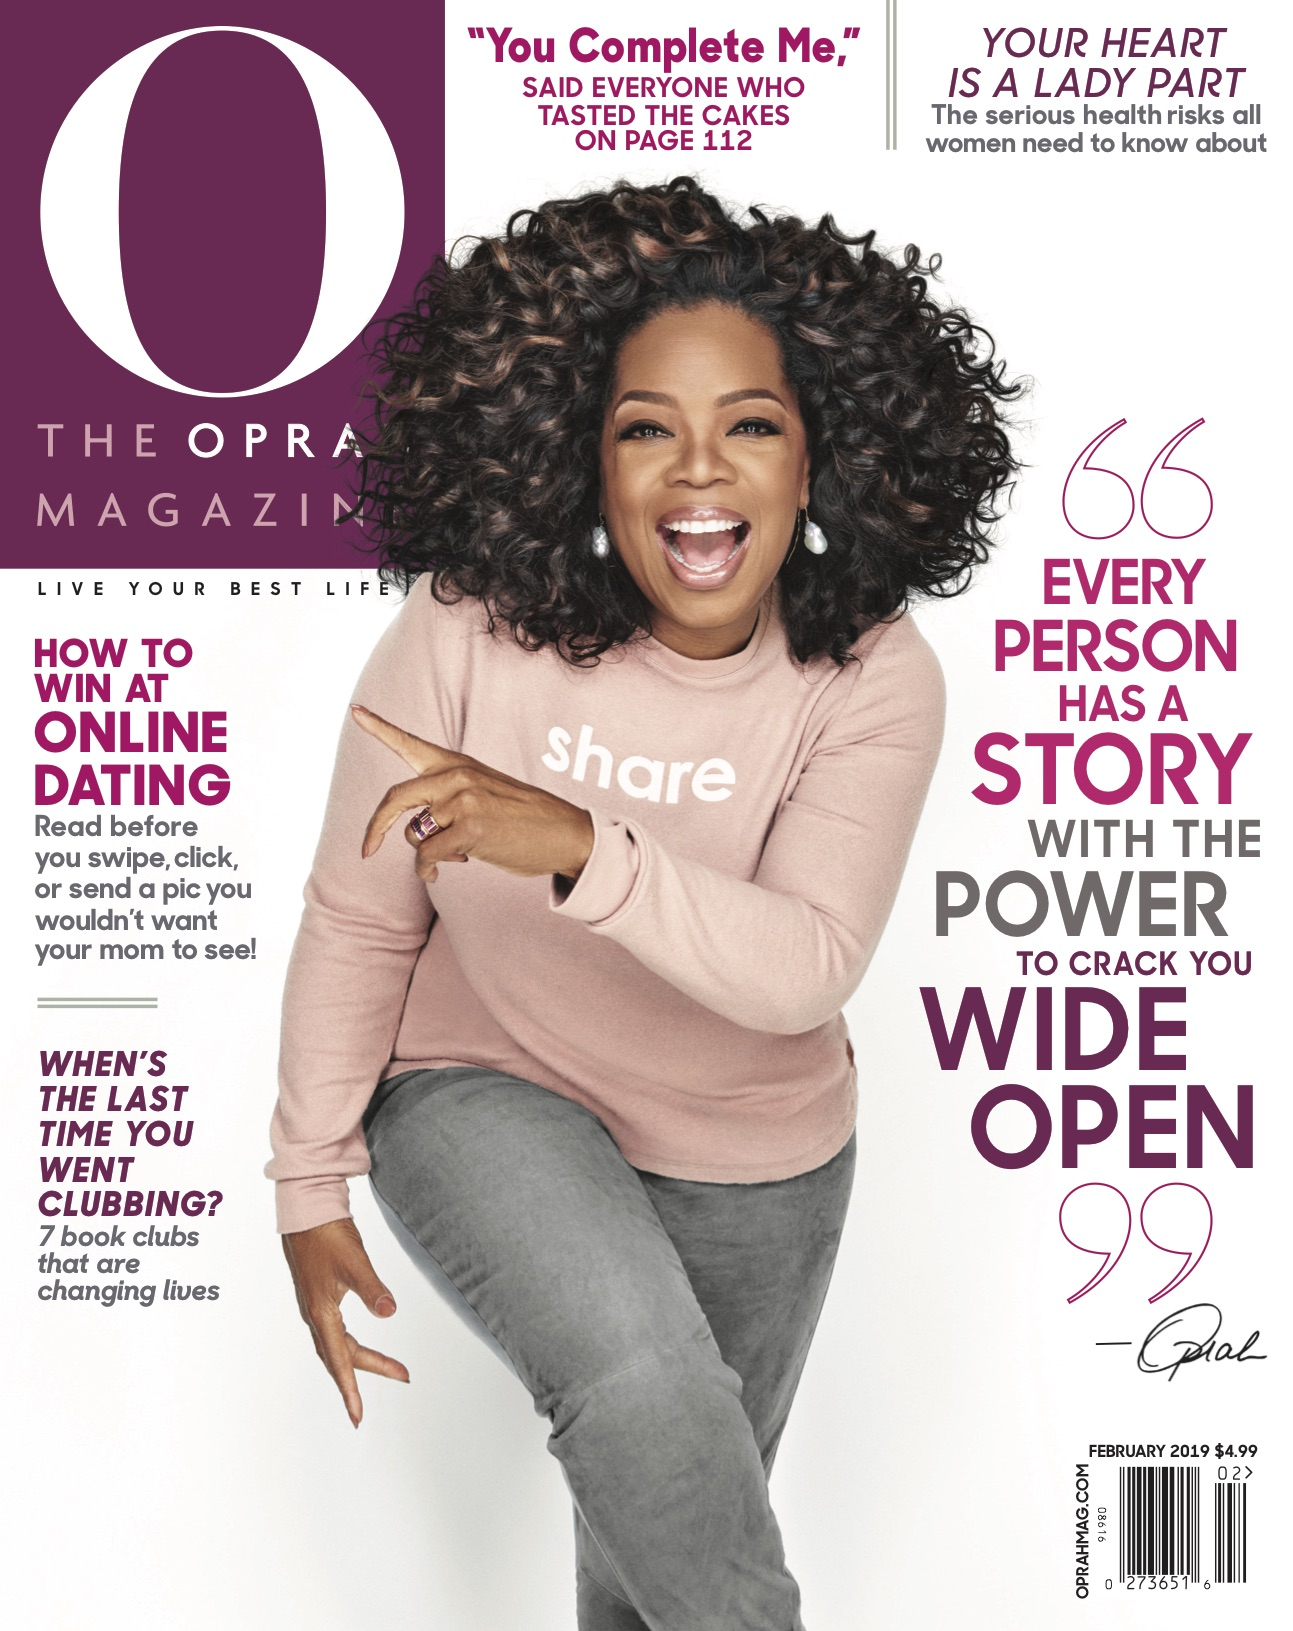 2019-2 Febuary - Cover of Oprah Magazine.jpg